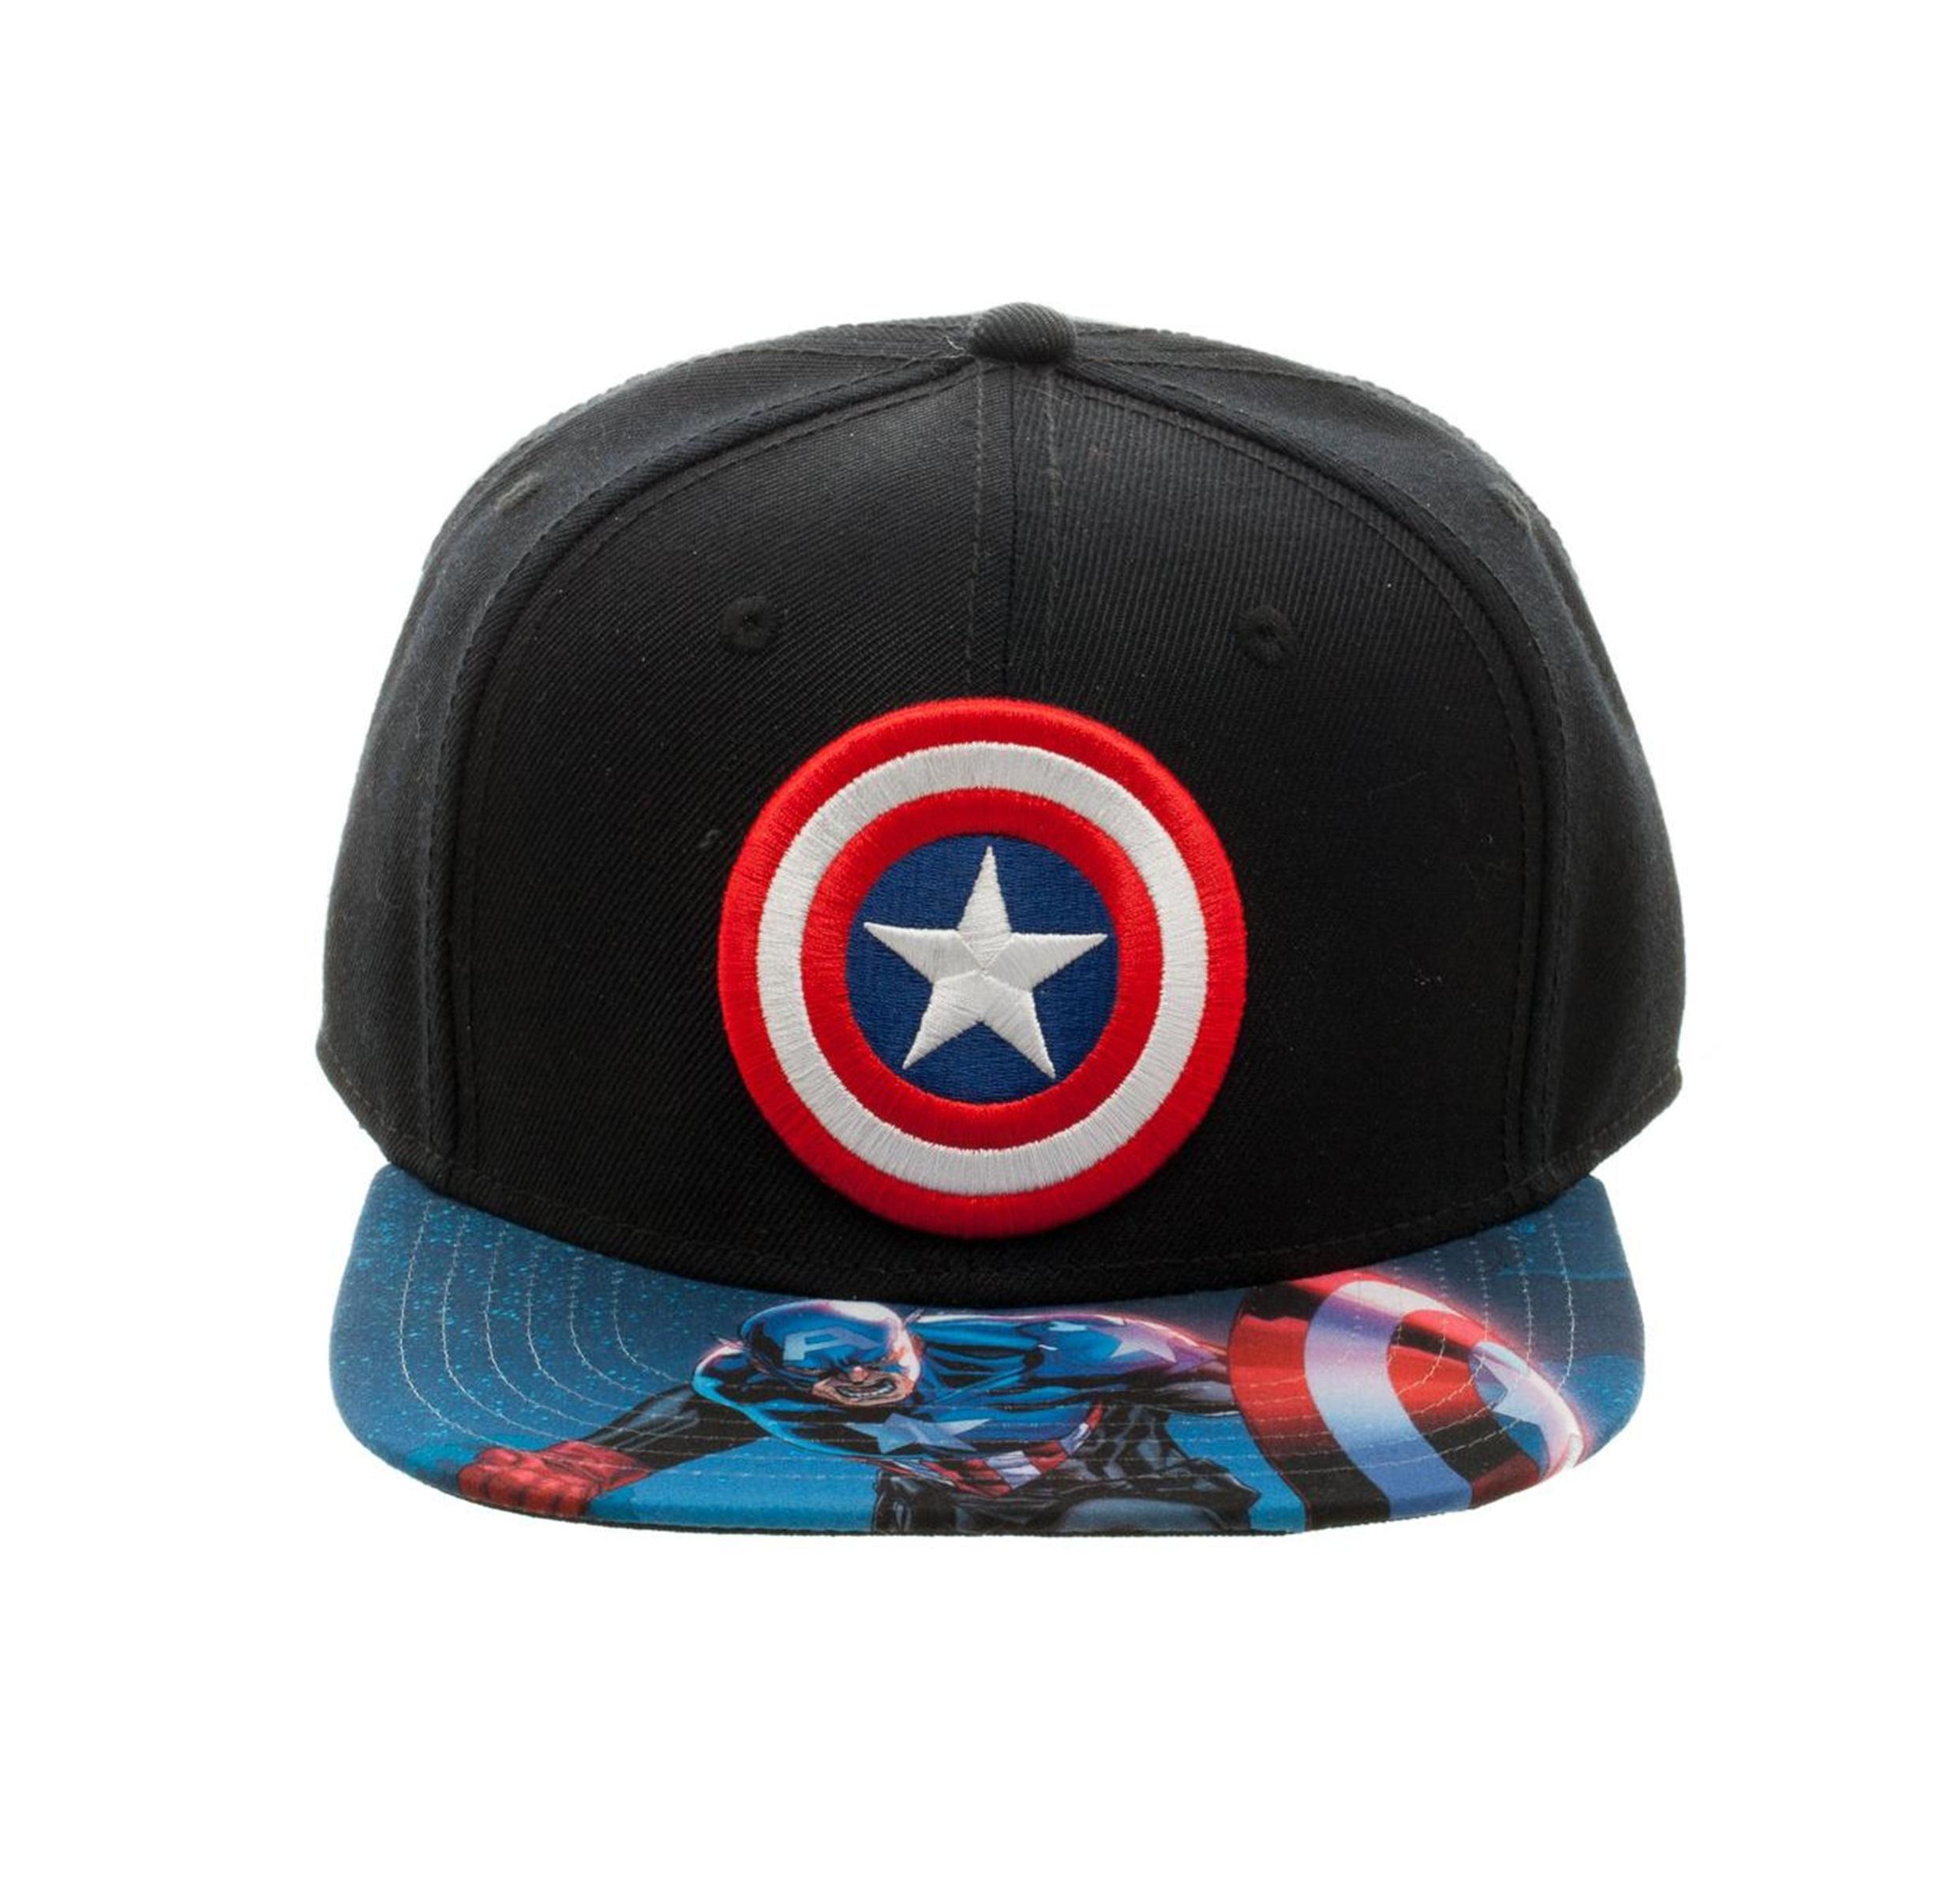 Bioworld Licensed Captain America - Marvel Comics Sublimated Brim ... e4fedc1701a